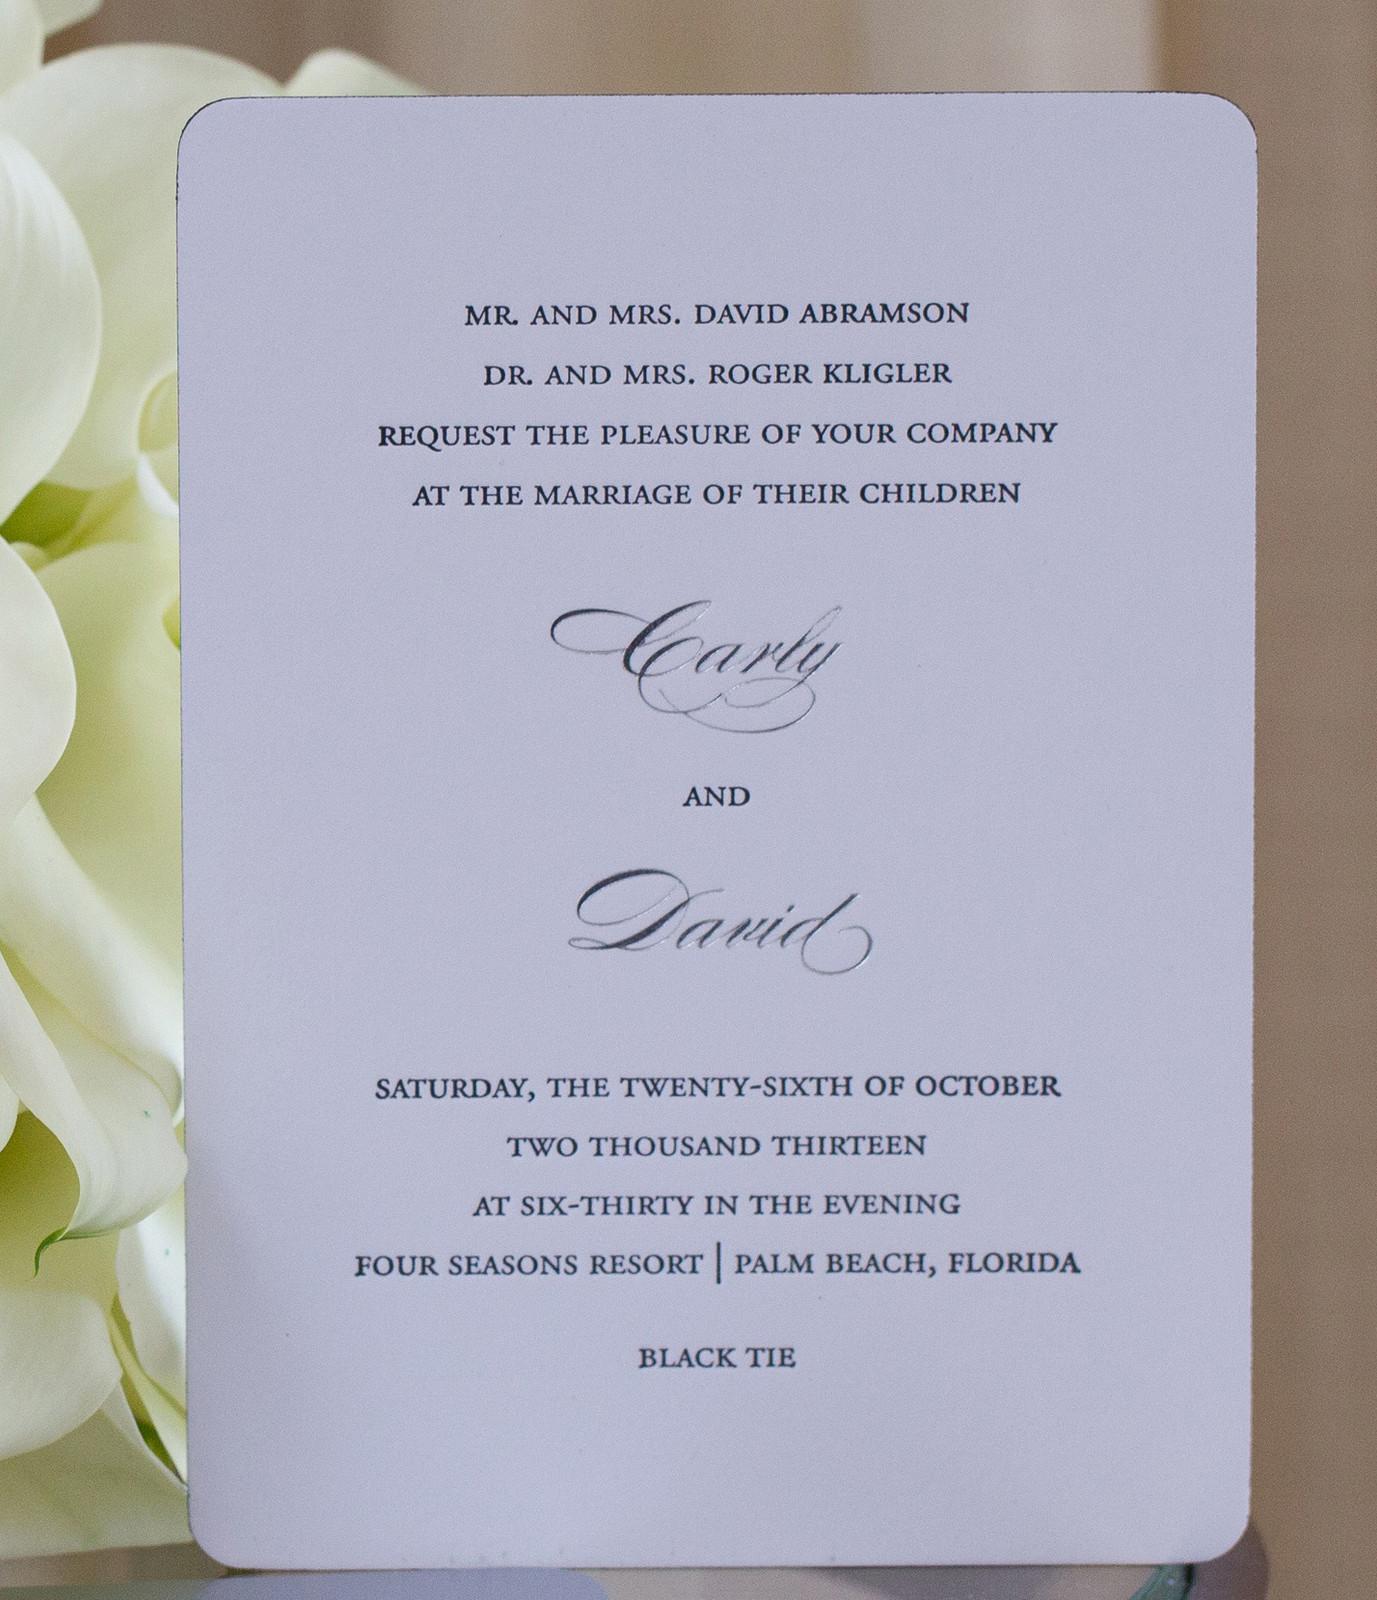 Wedding Invitations In Maryland: Baltimore, Maryland Wedding